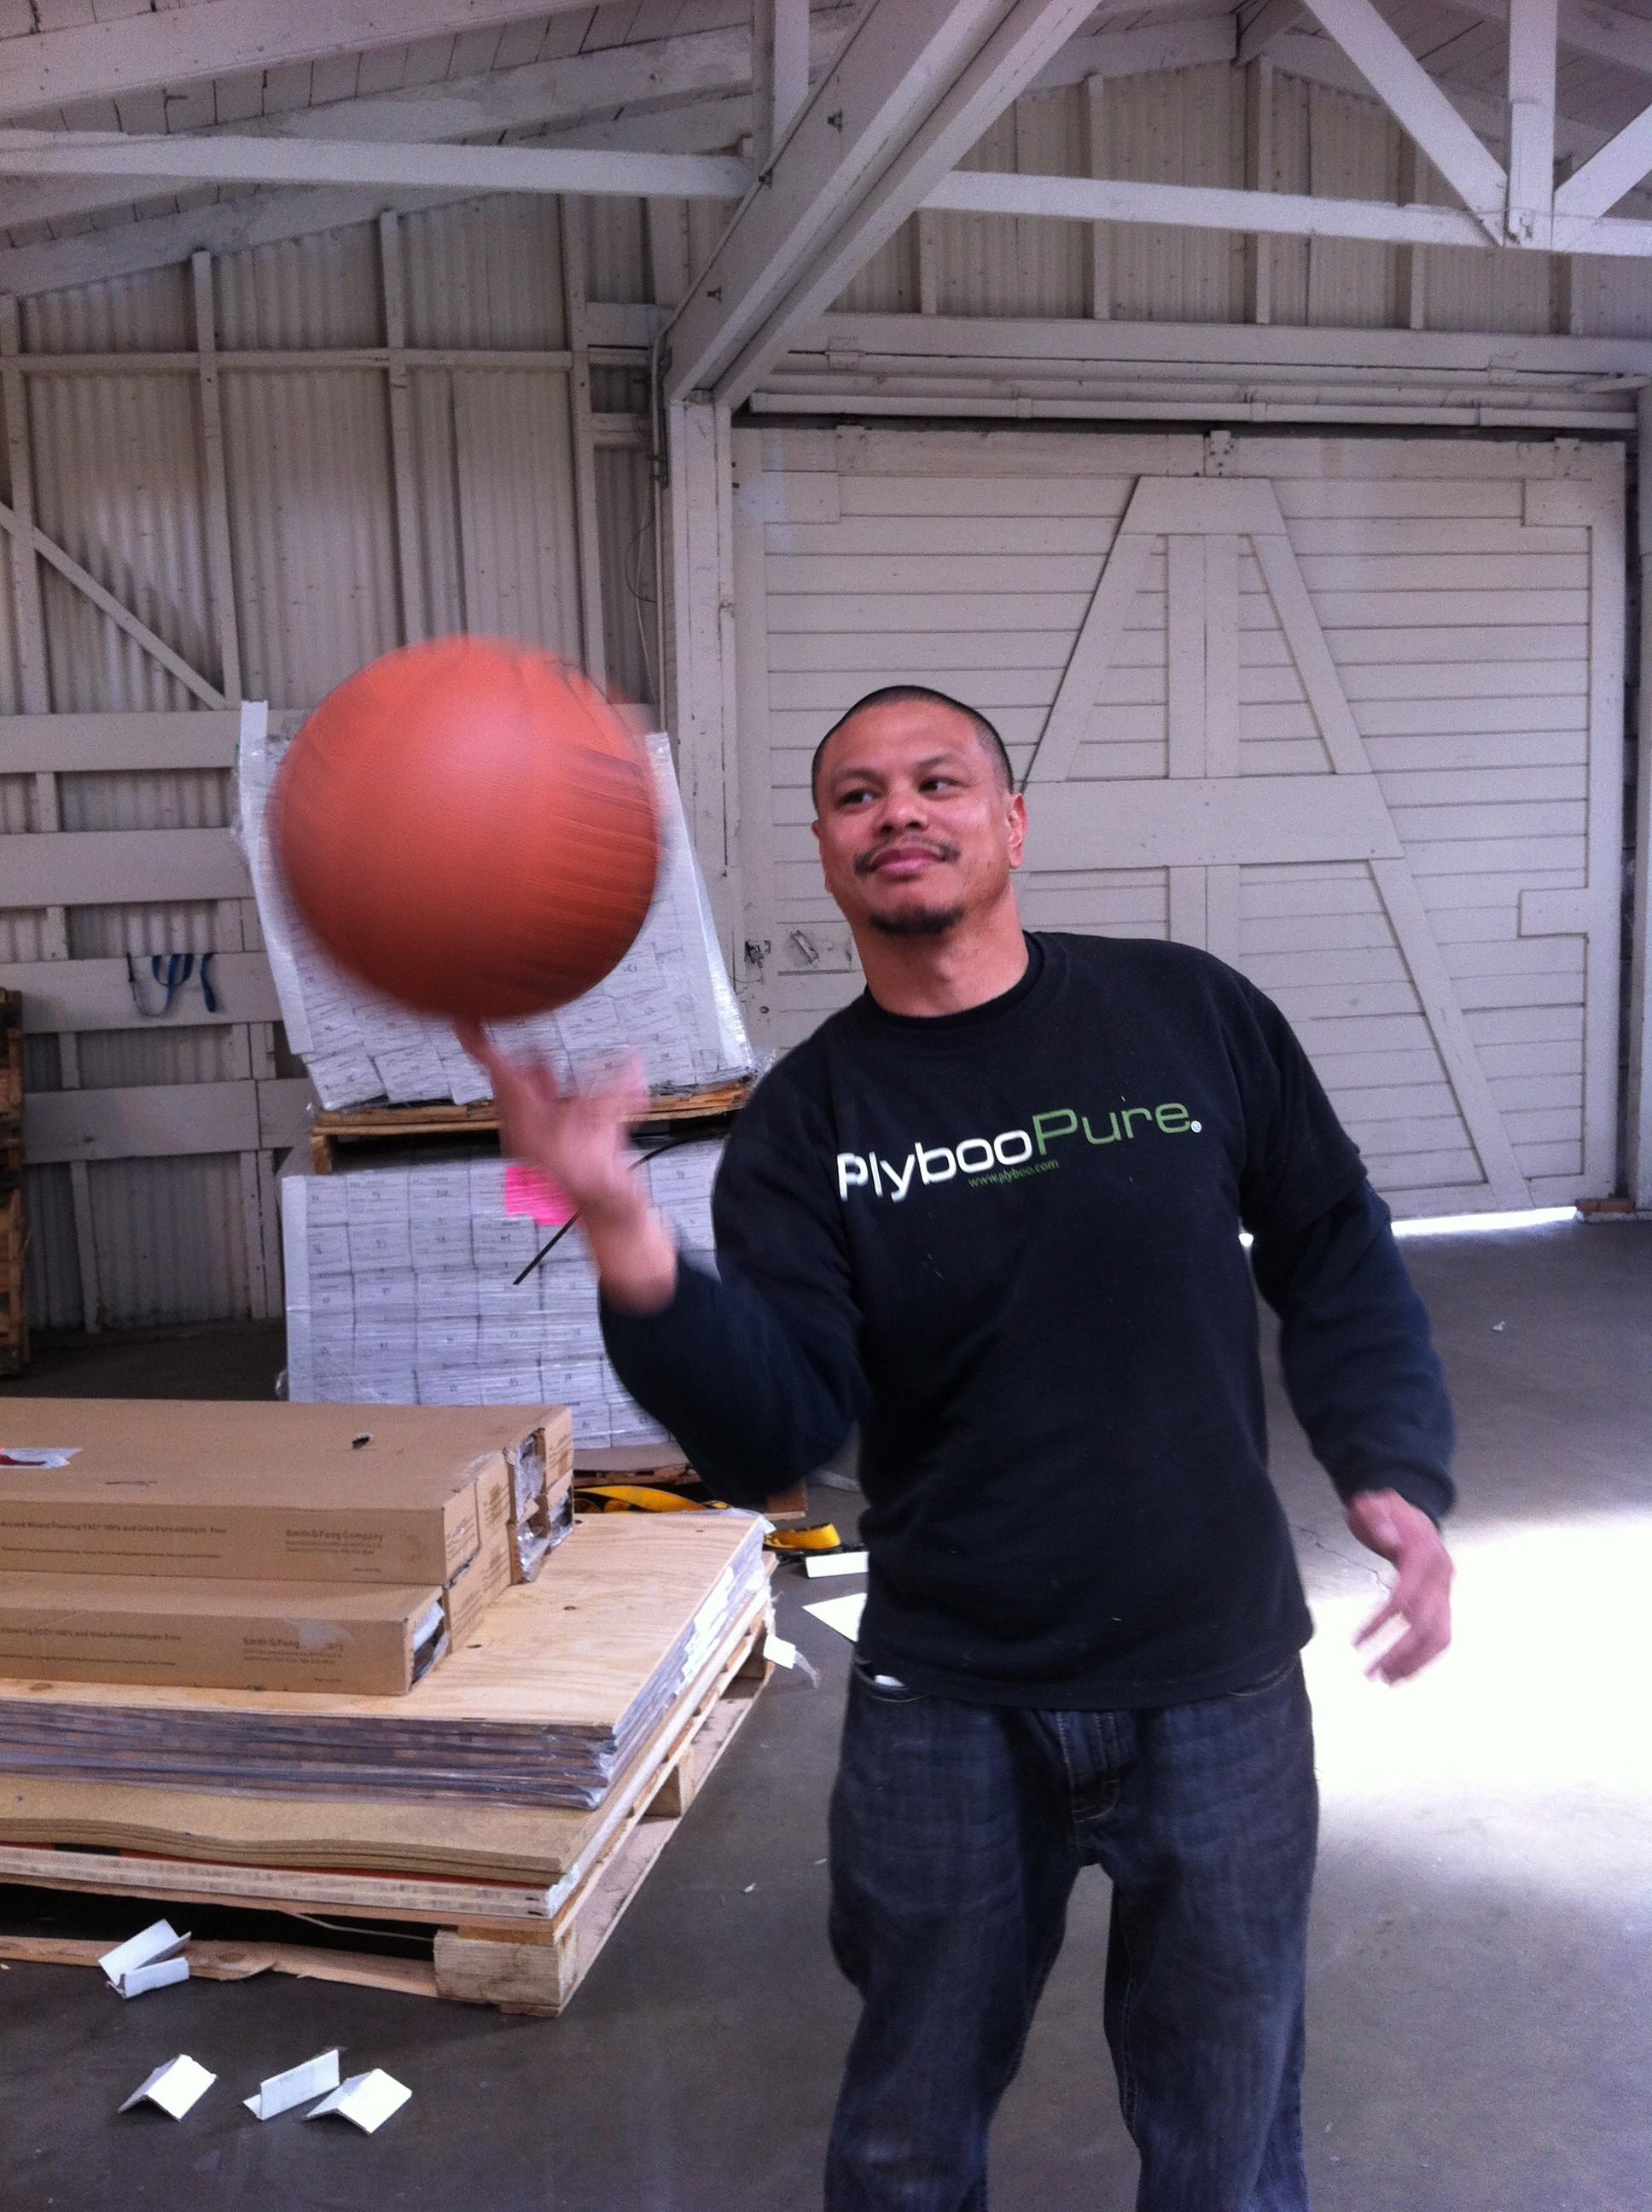 plyboosport  basketball court